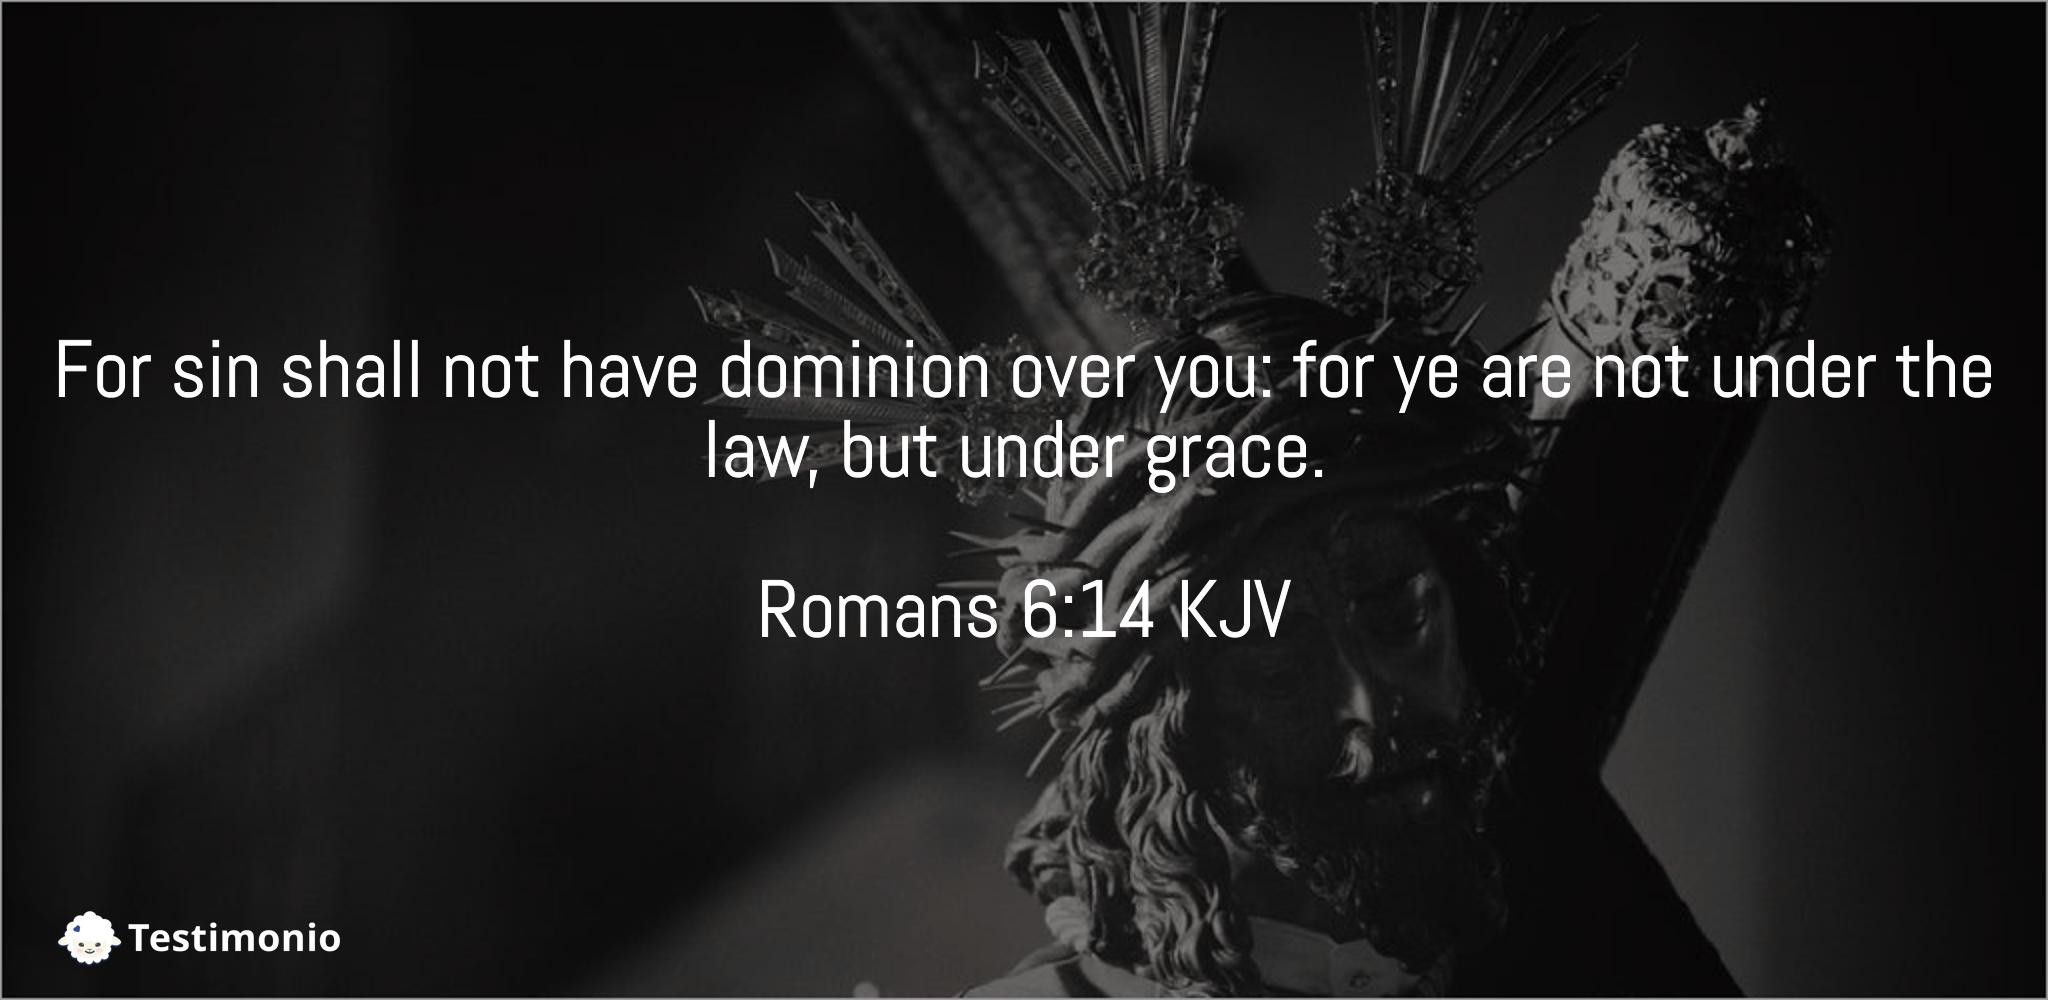 Romans 6:14